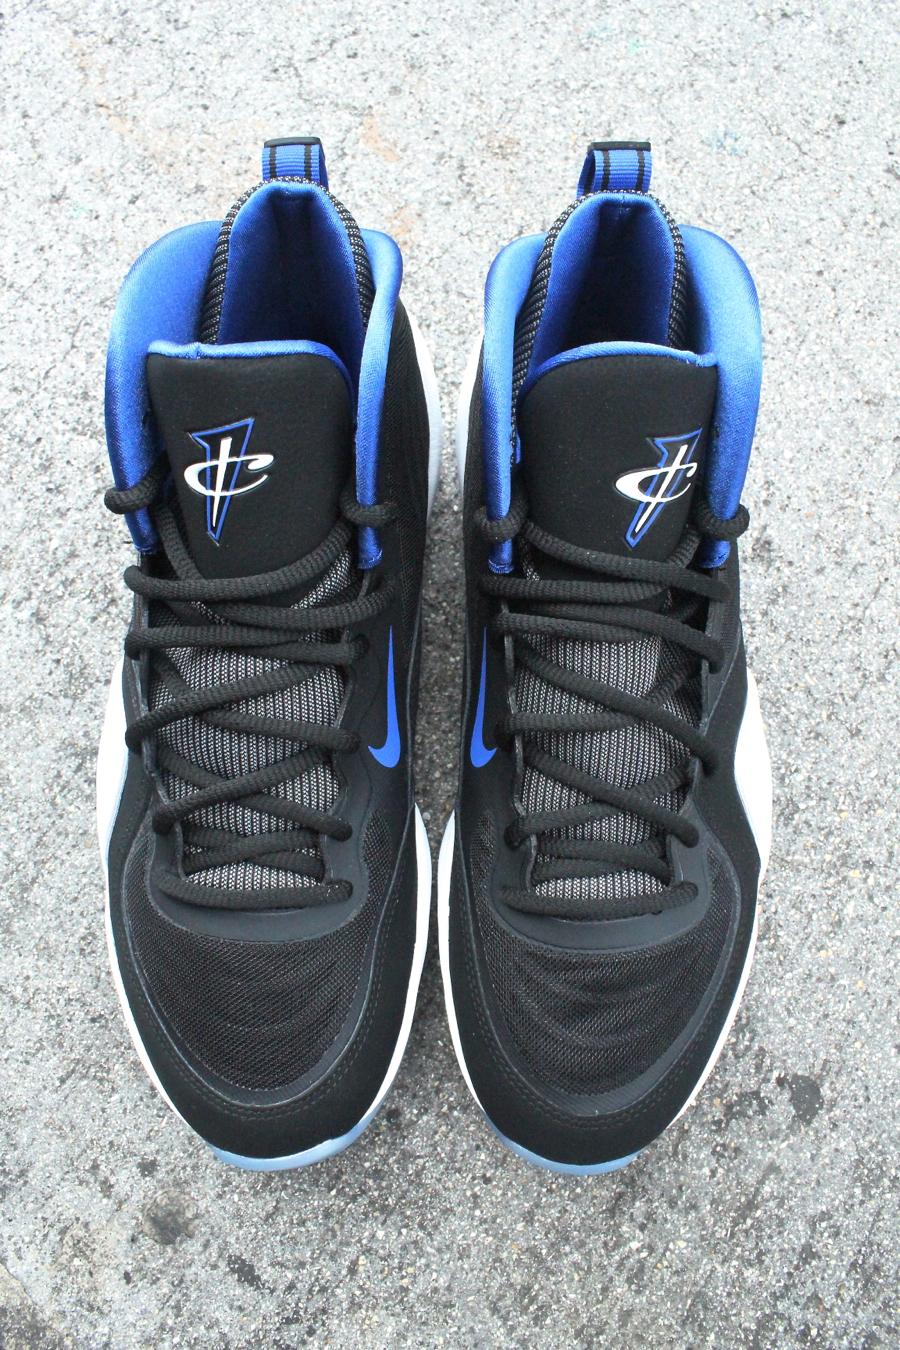 Nike Air Penny V (5) 'Orlando' at Mr. R Sports